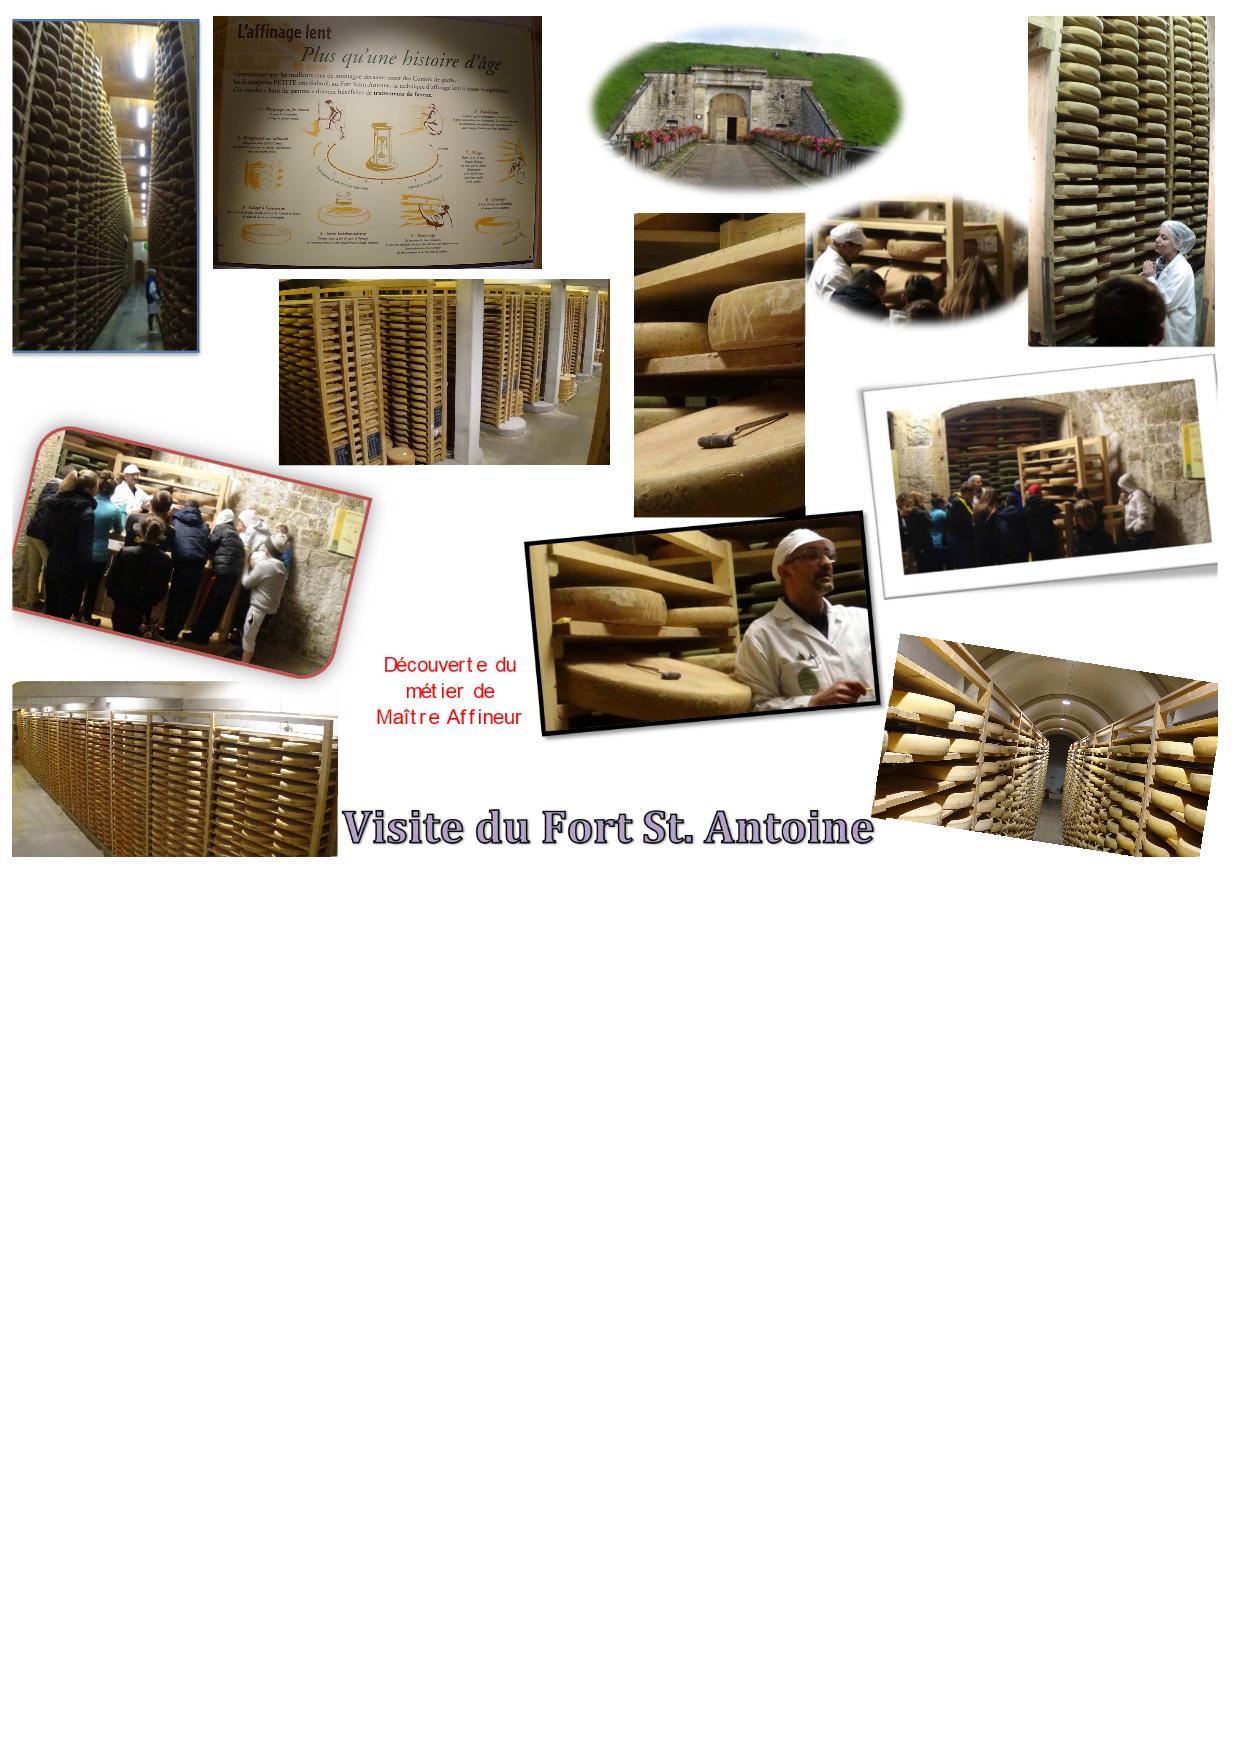 Aurore_St Antoine-page-001-1